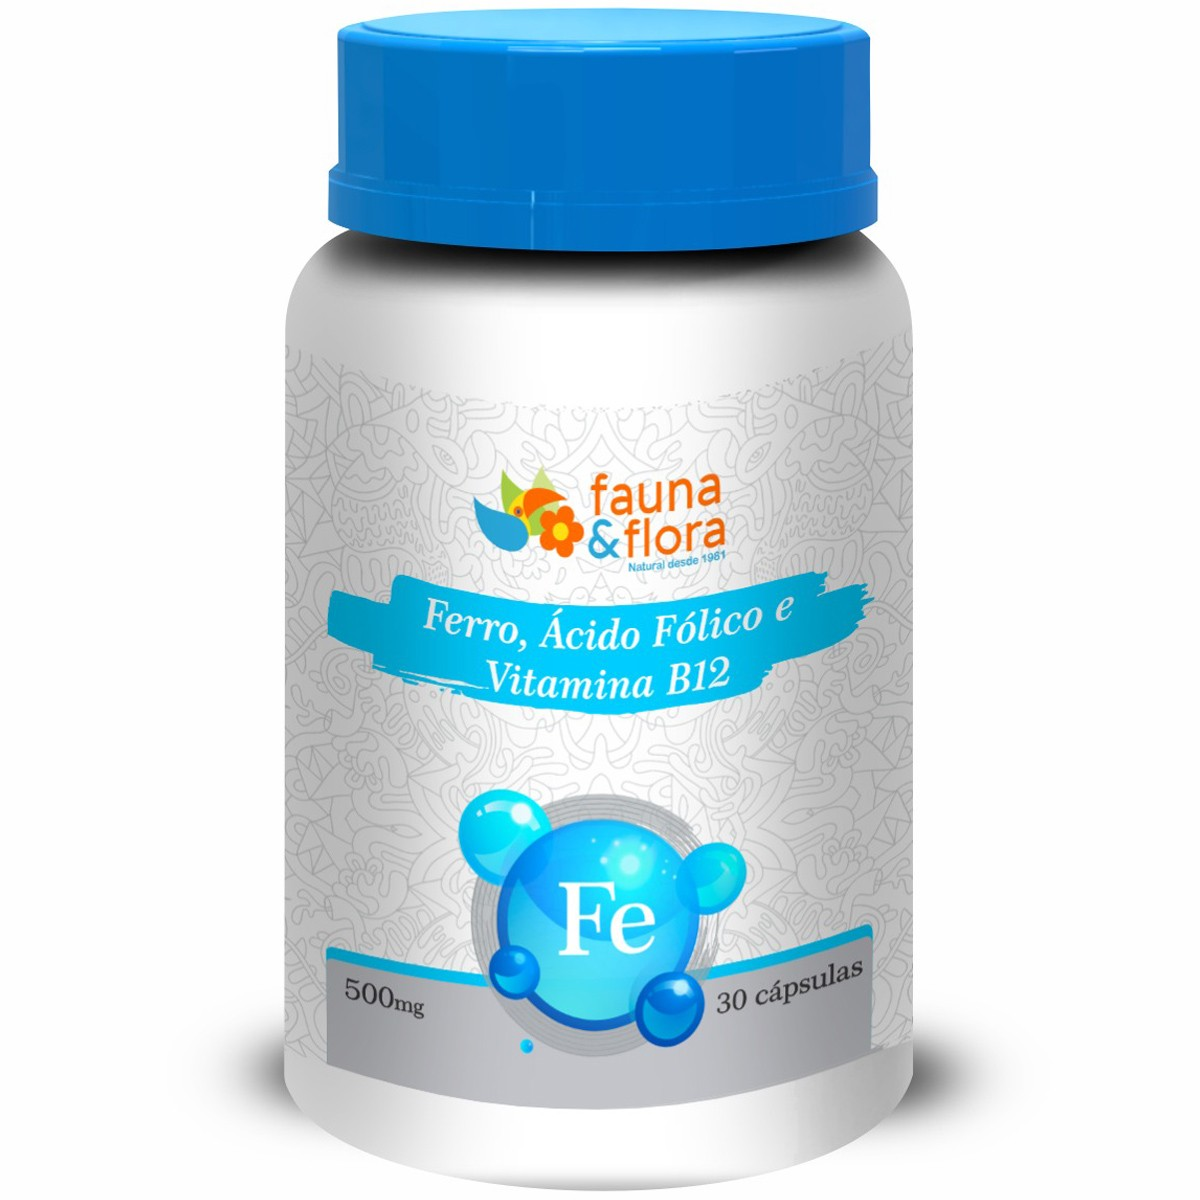 Ferro, Ácido Fólico e Vitamina B12 500mg 30 Cápsulas